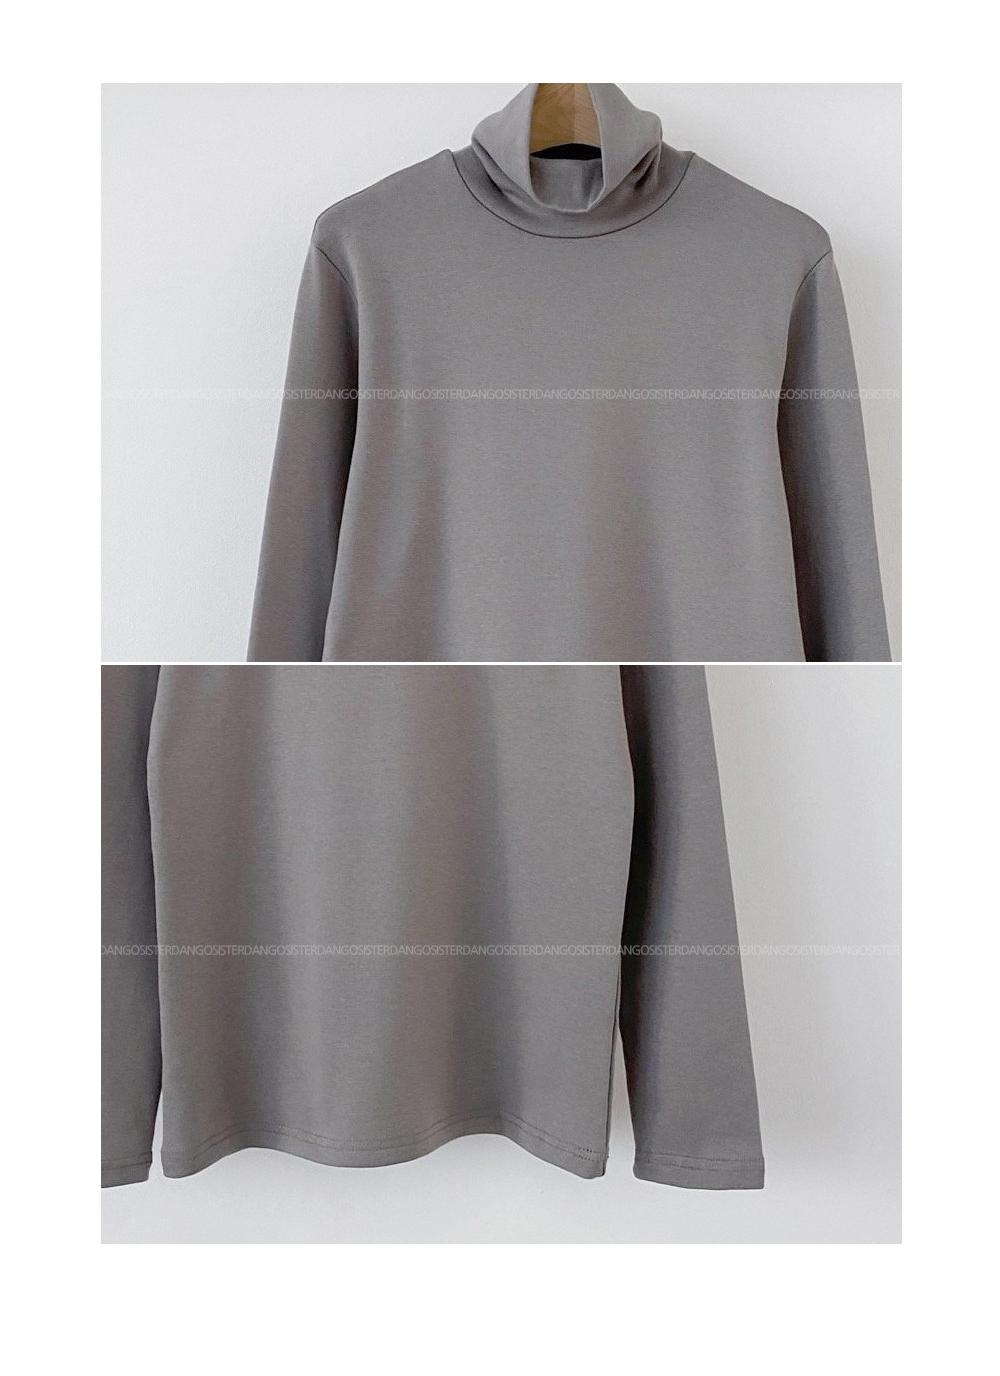 accessories grey color image-S1L2